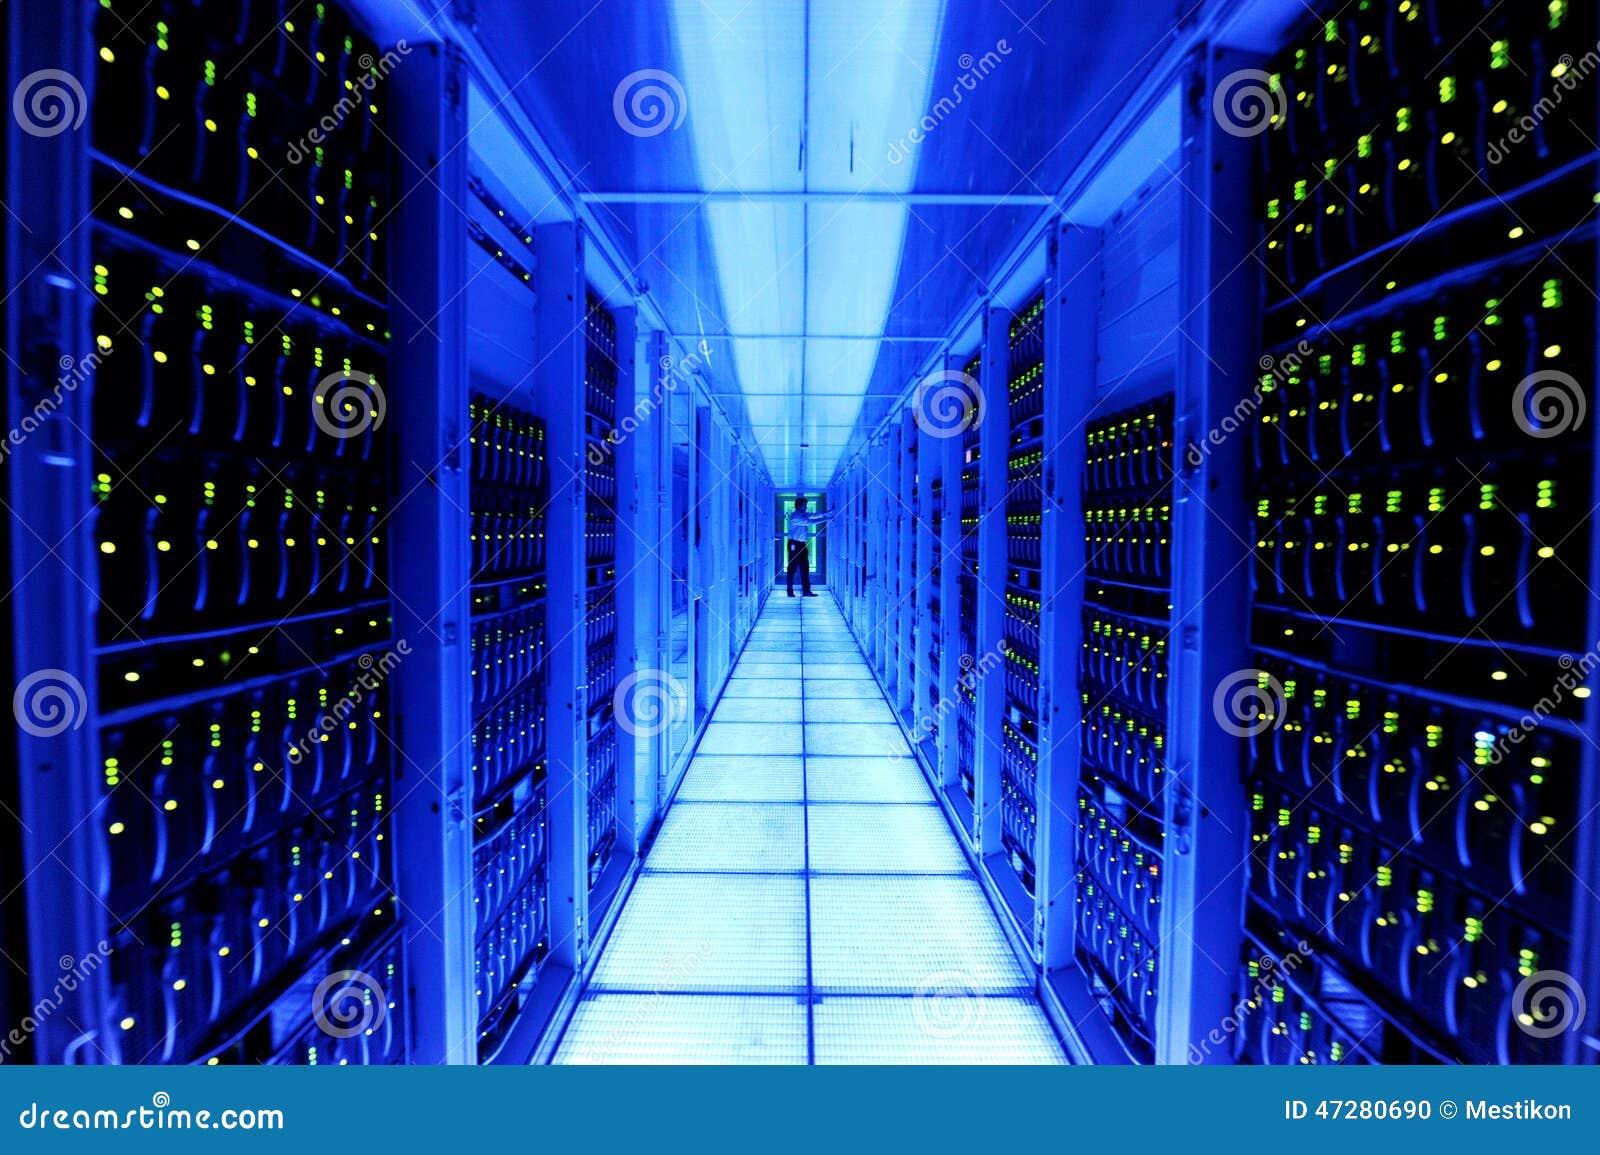 Hosting domain free image.